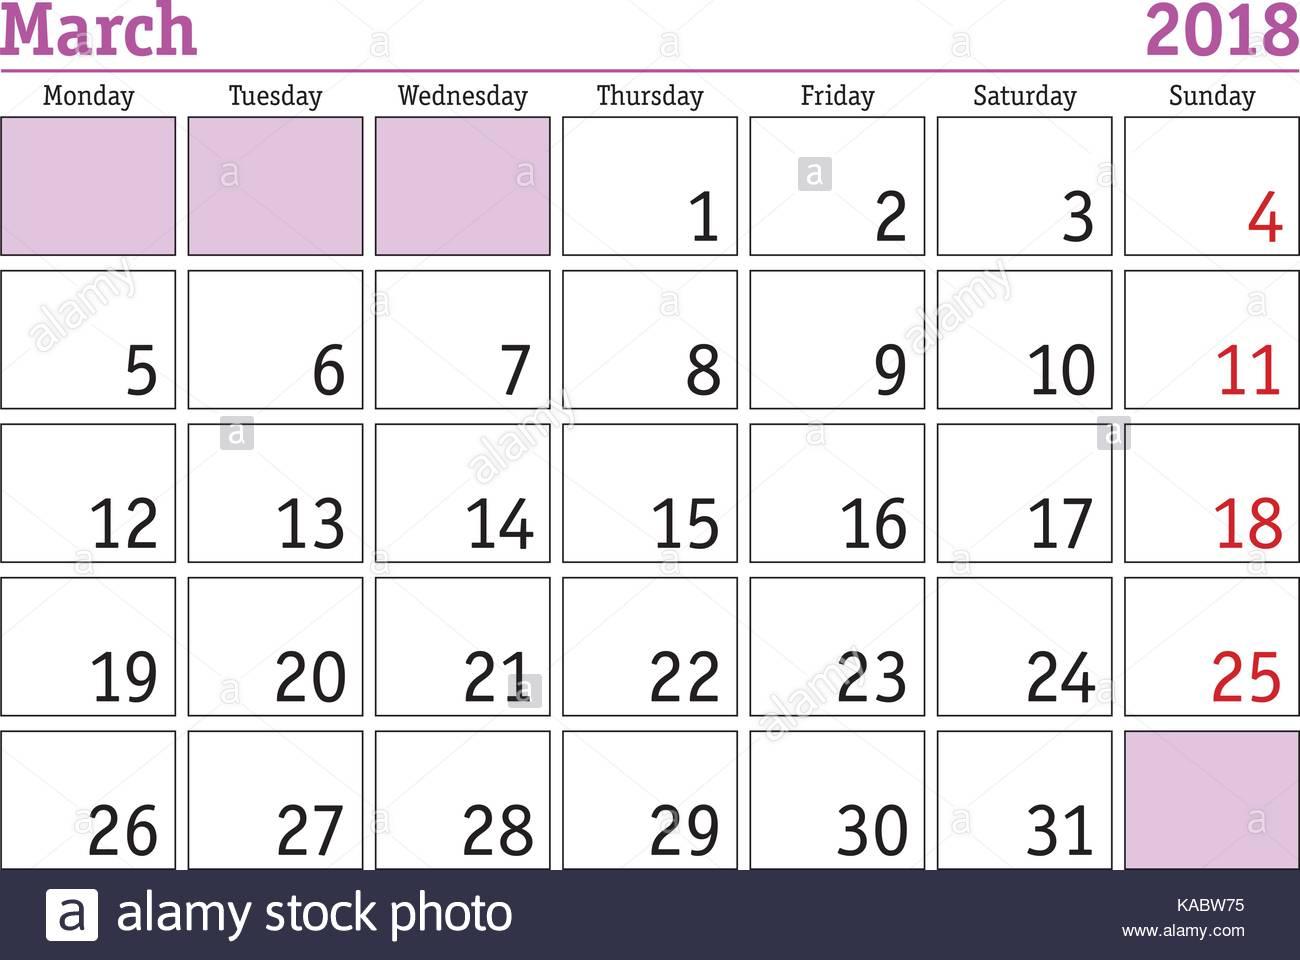 simple digital calendar for march 2018 vector printable calendar monthly scheduler week starts on monday english calendar